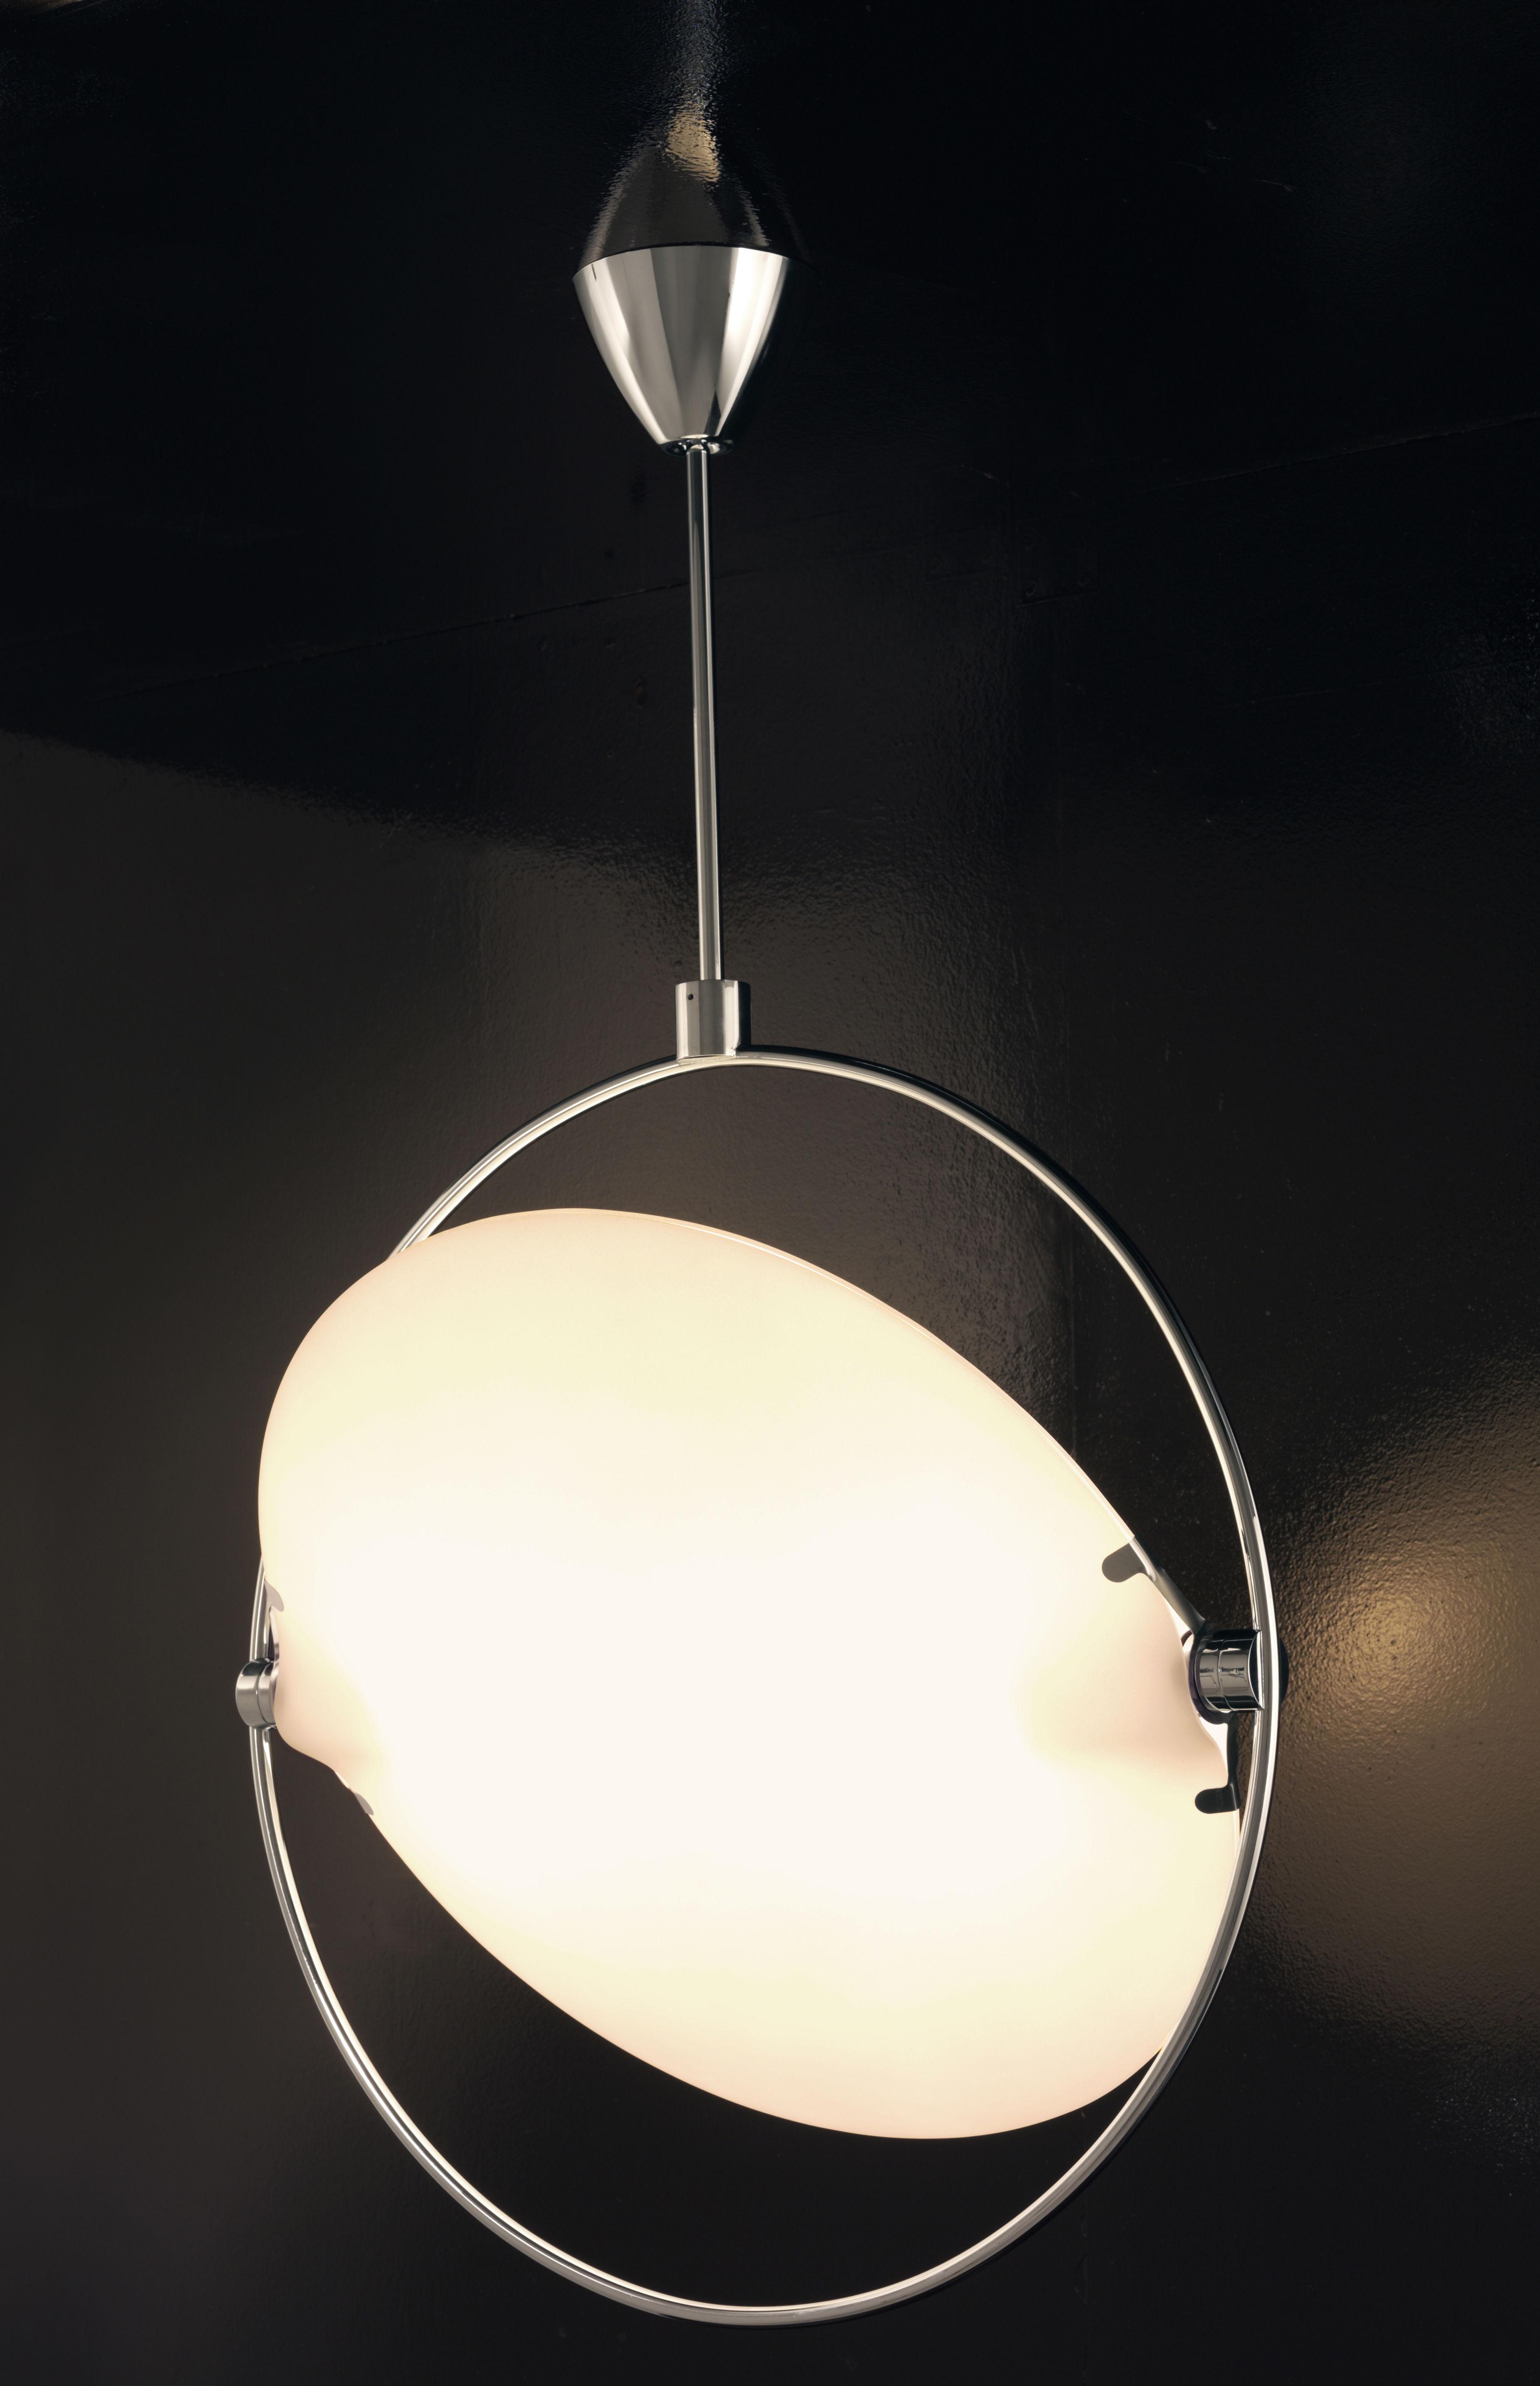 Nobona Sospensione Alto 102 cm by Fontana Arte | Made In Design